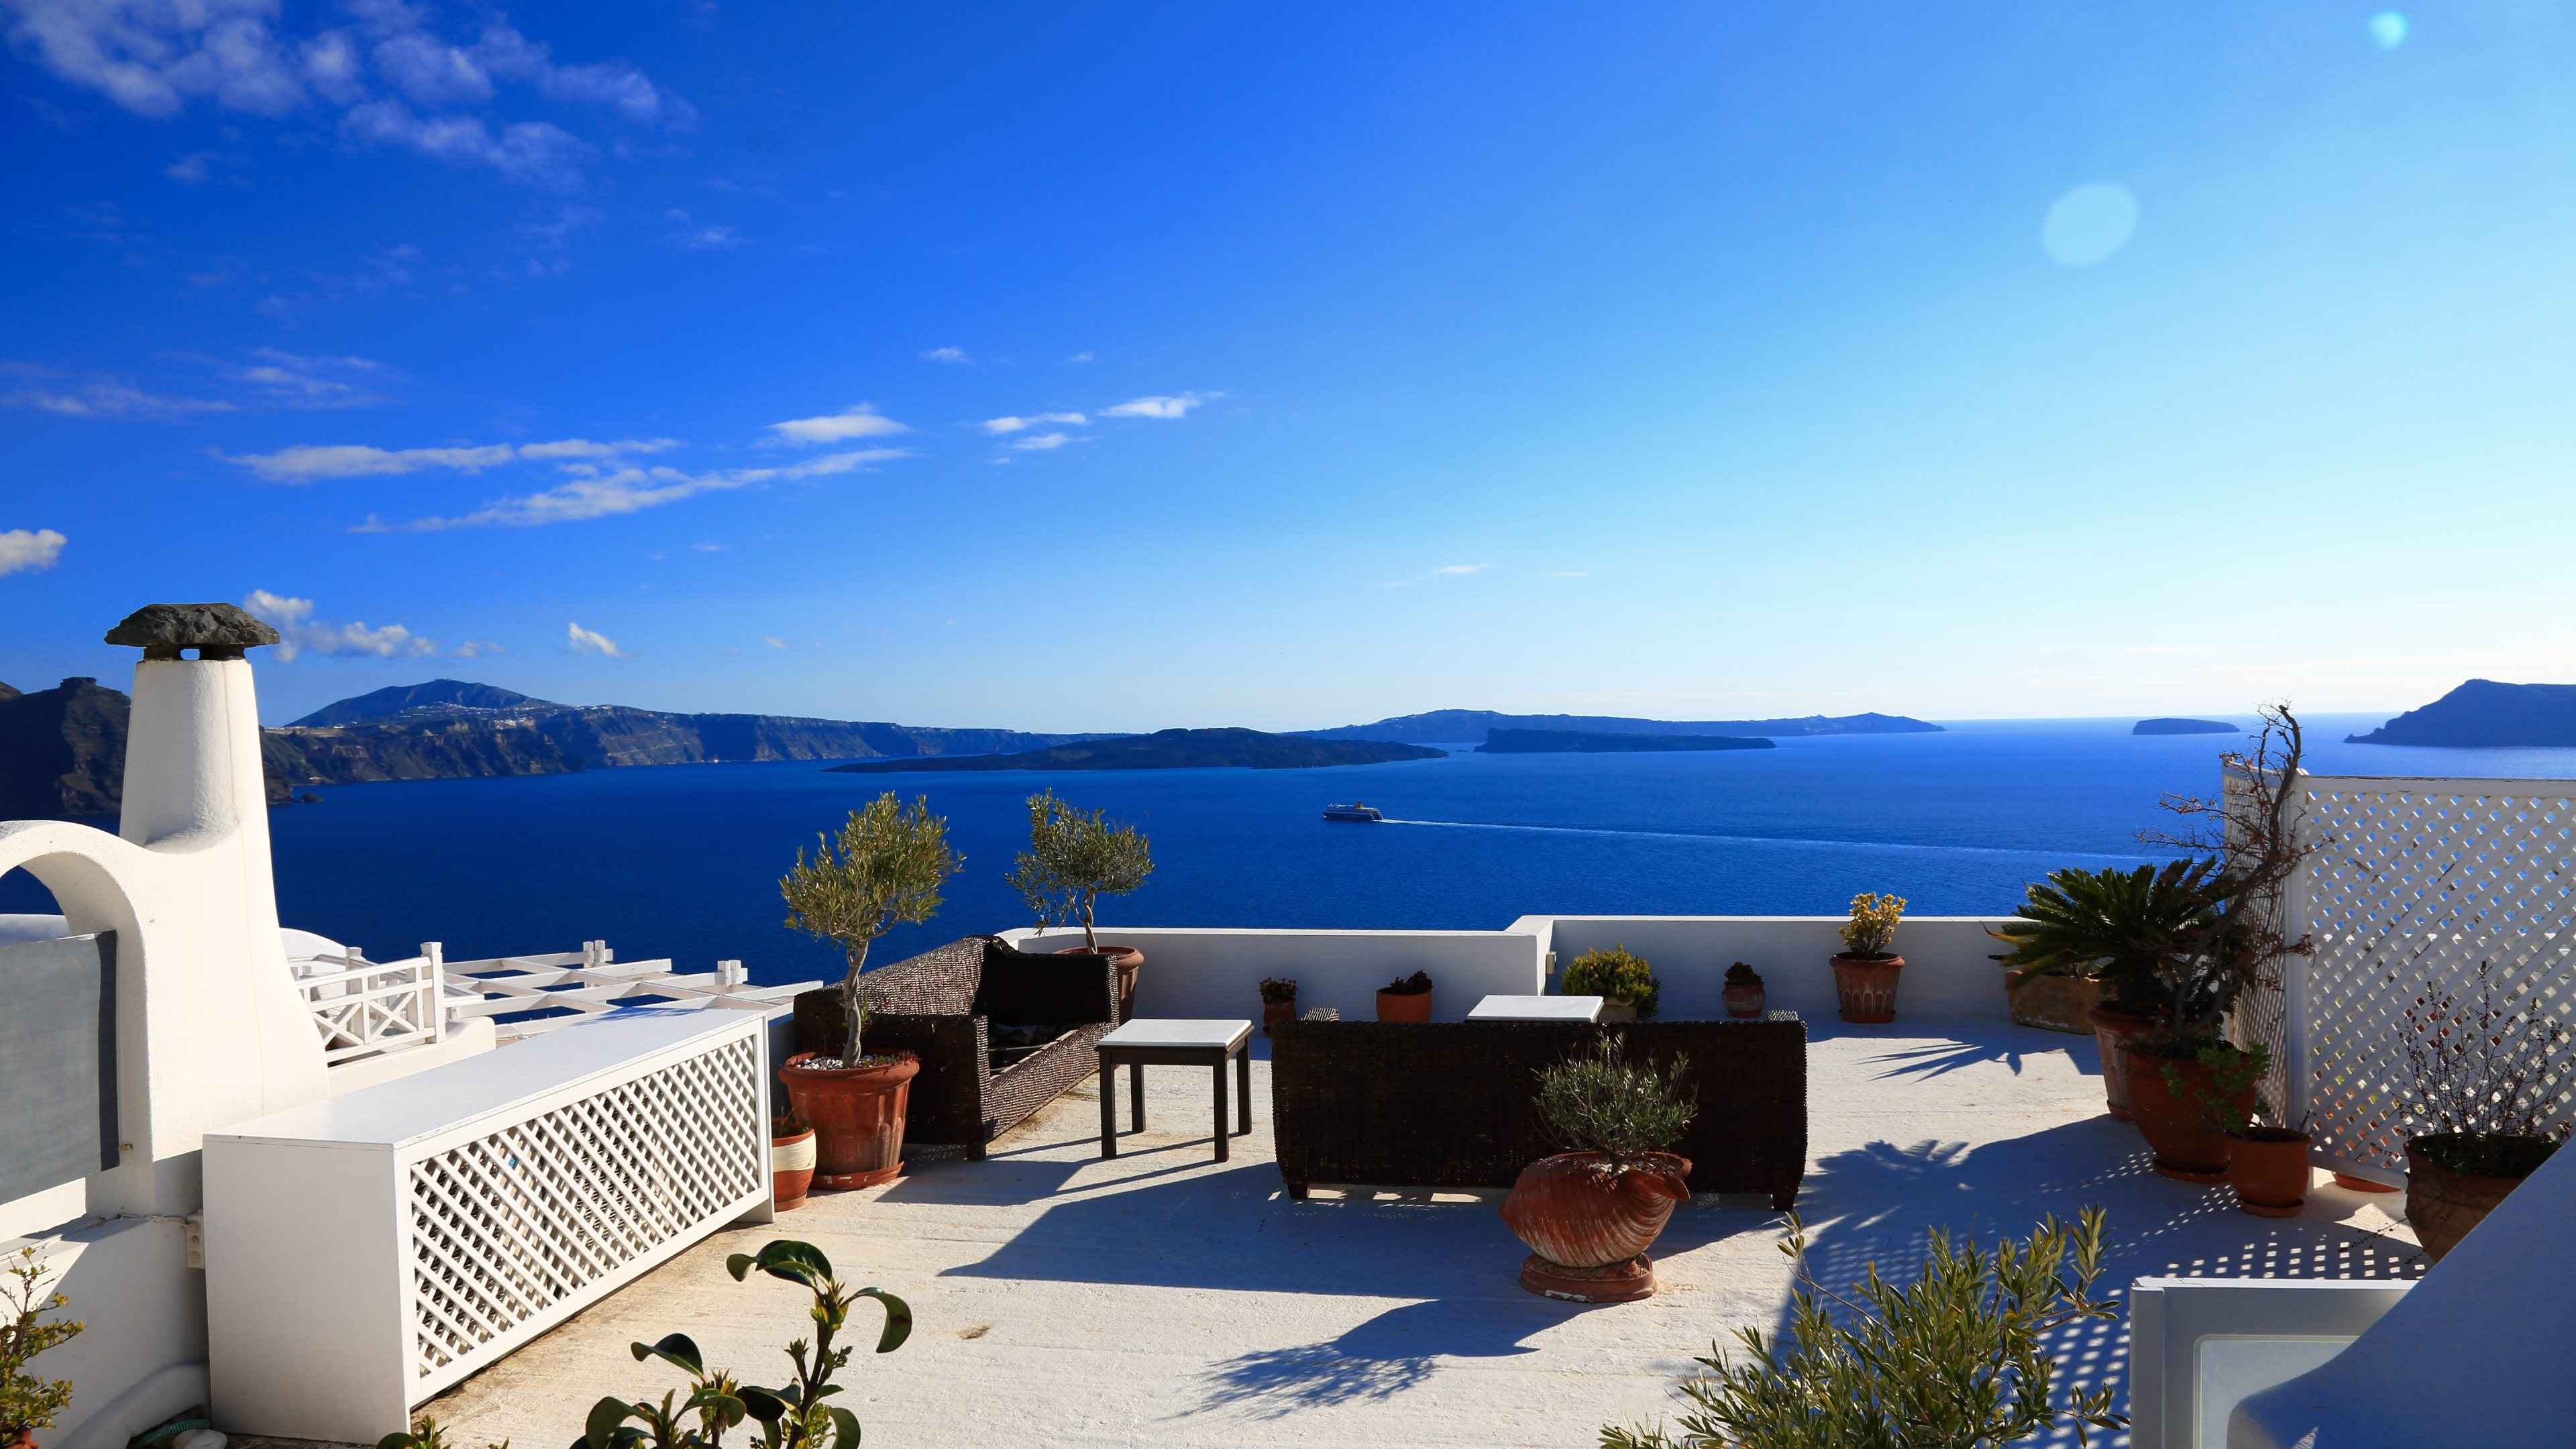 wallpaper santorini greece island - photo #49